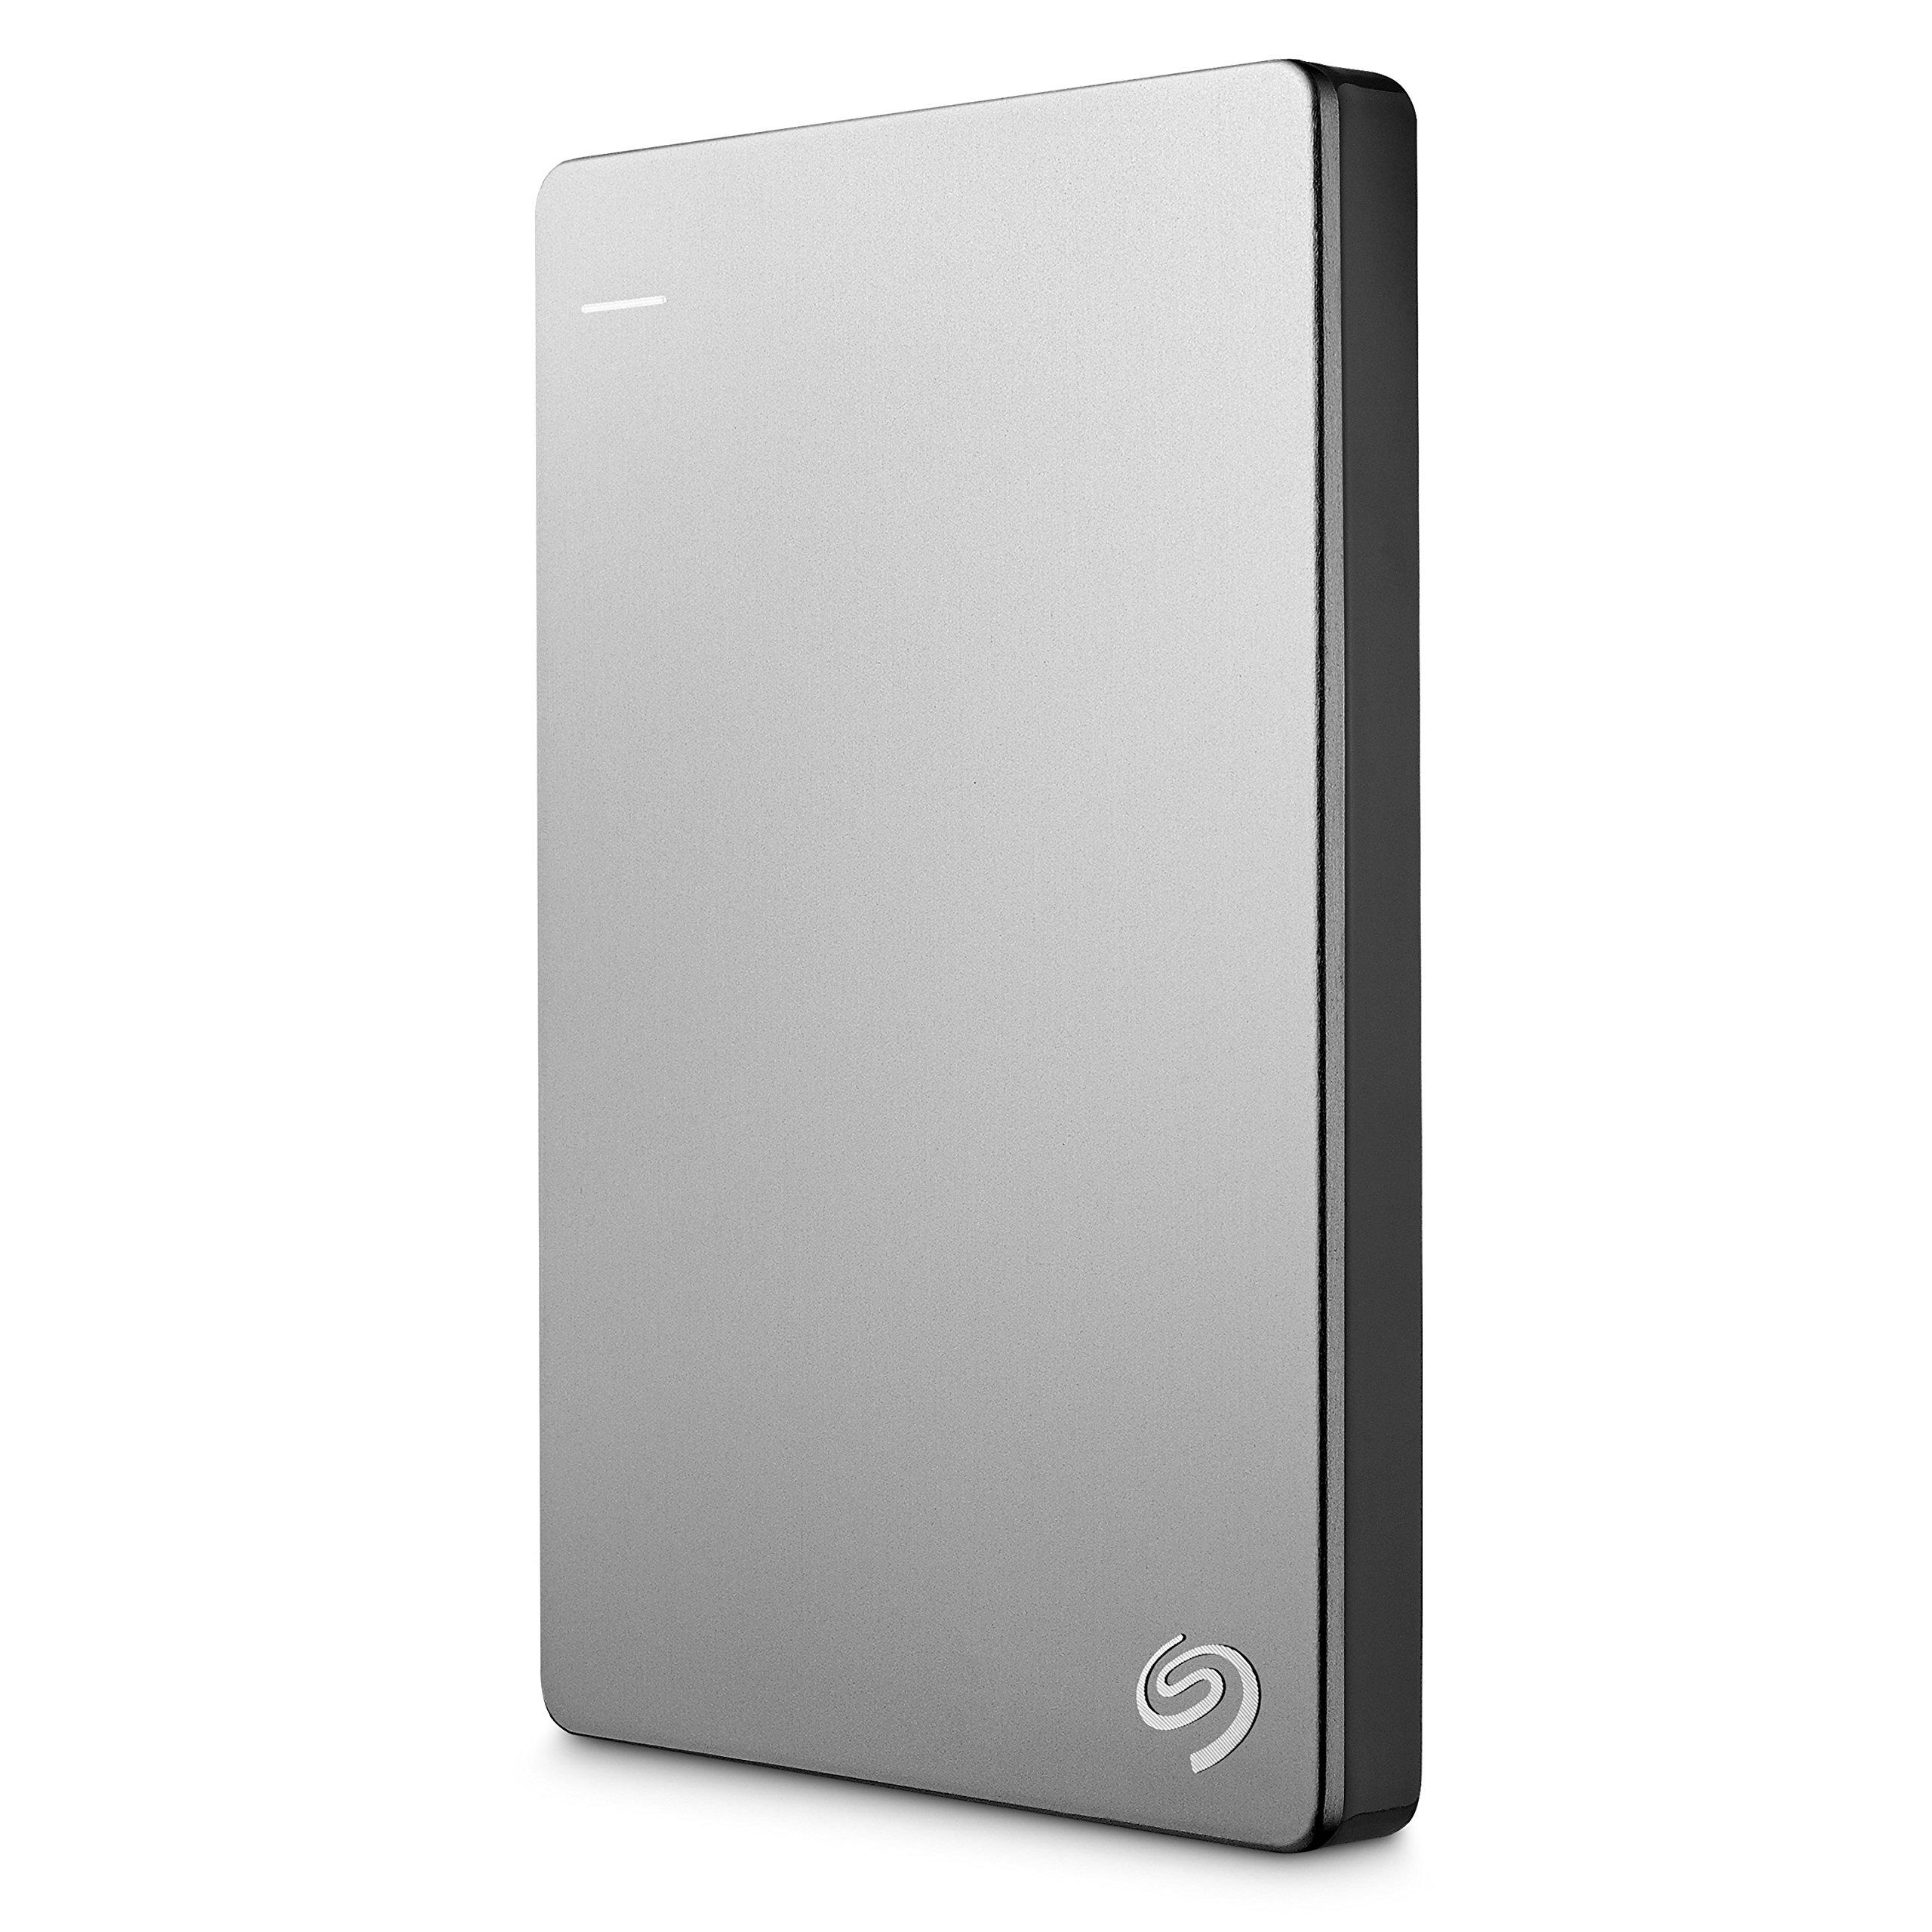 Seagate Backup Plus Slim 1TB Portable External Hard Drive for Mac USB 3.0 (STDS1000100) by Seagate